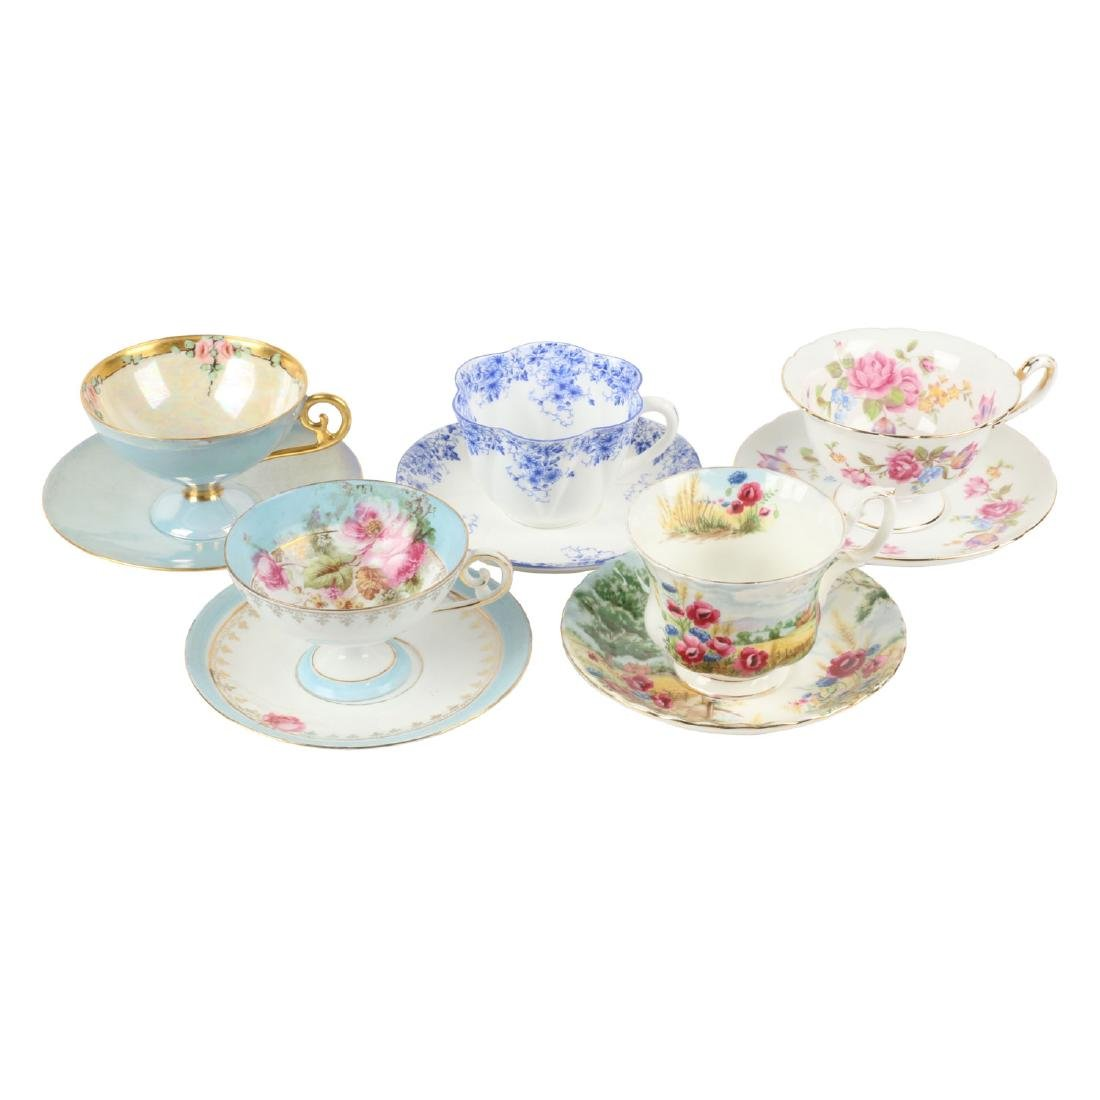 Twenty-two (22) sets of Tea Cups & Saucers